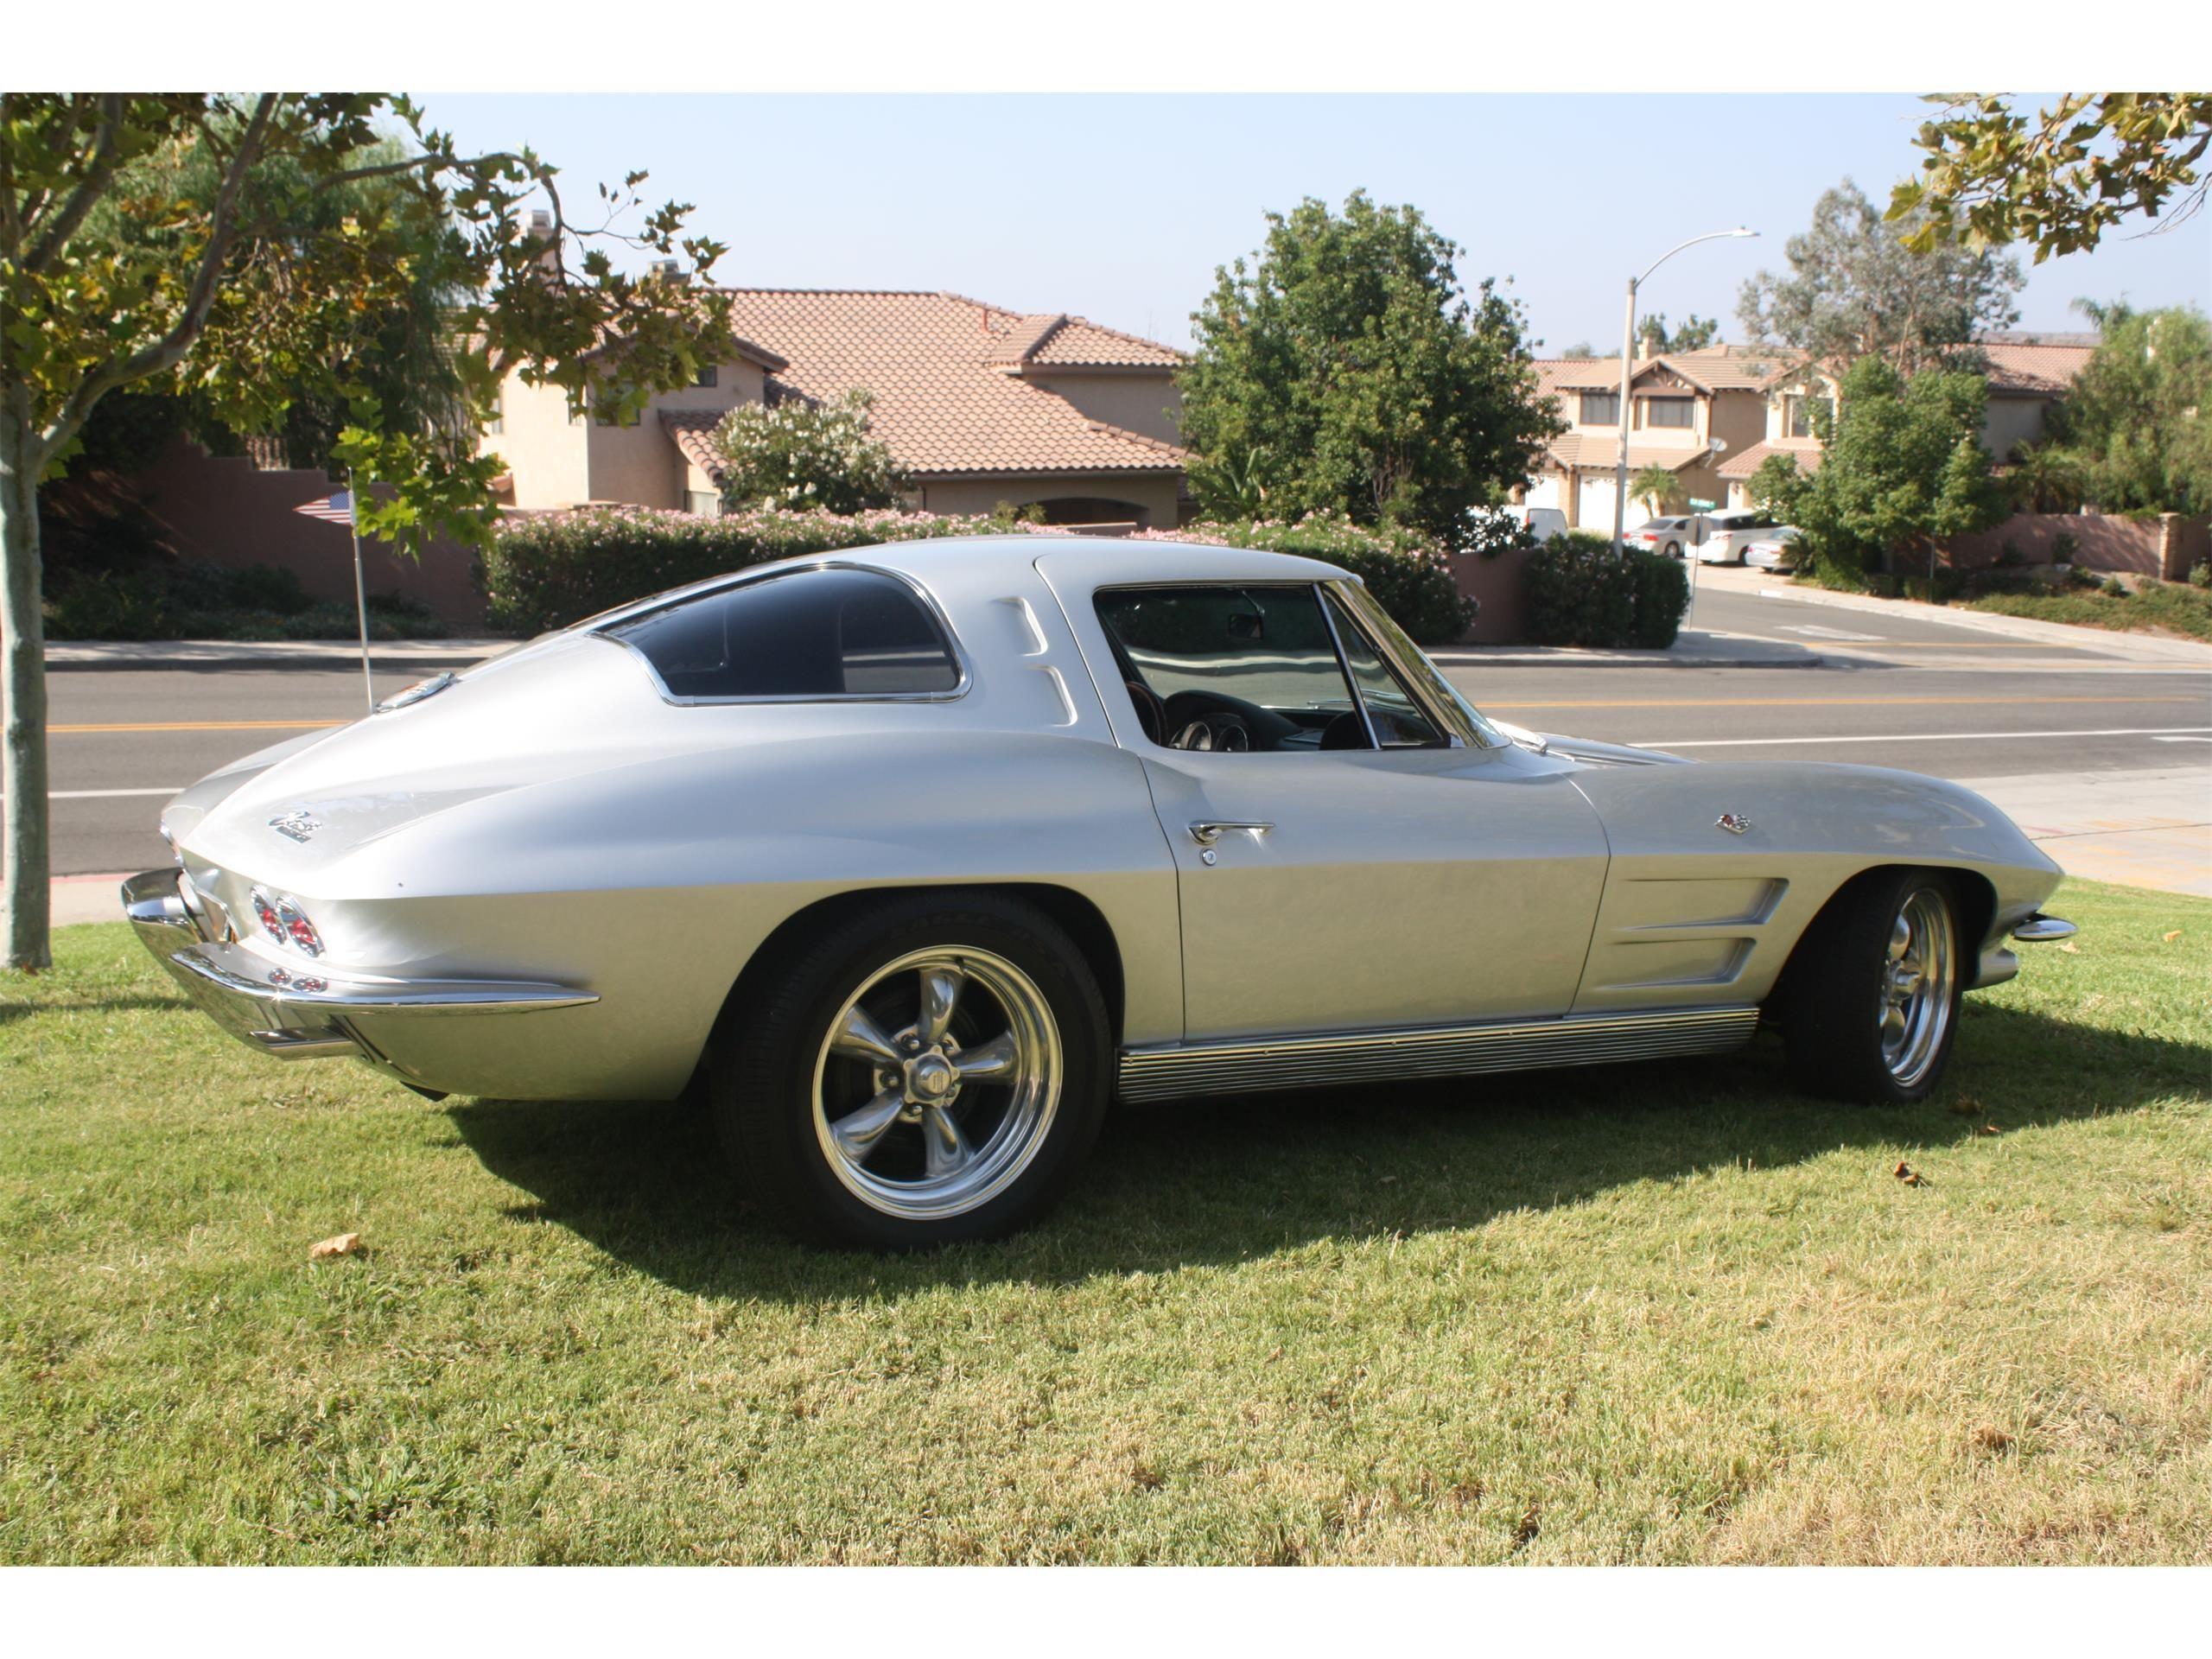 Classic 63 Chevrolet Corvette For Sale Listing Id Cc 1156325